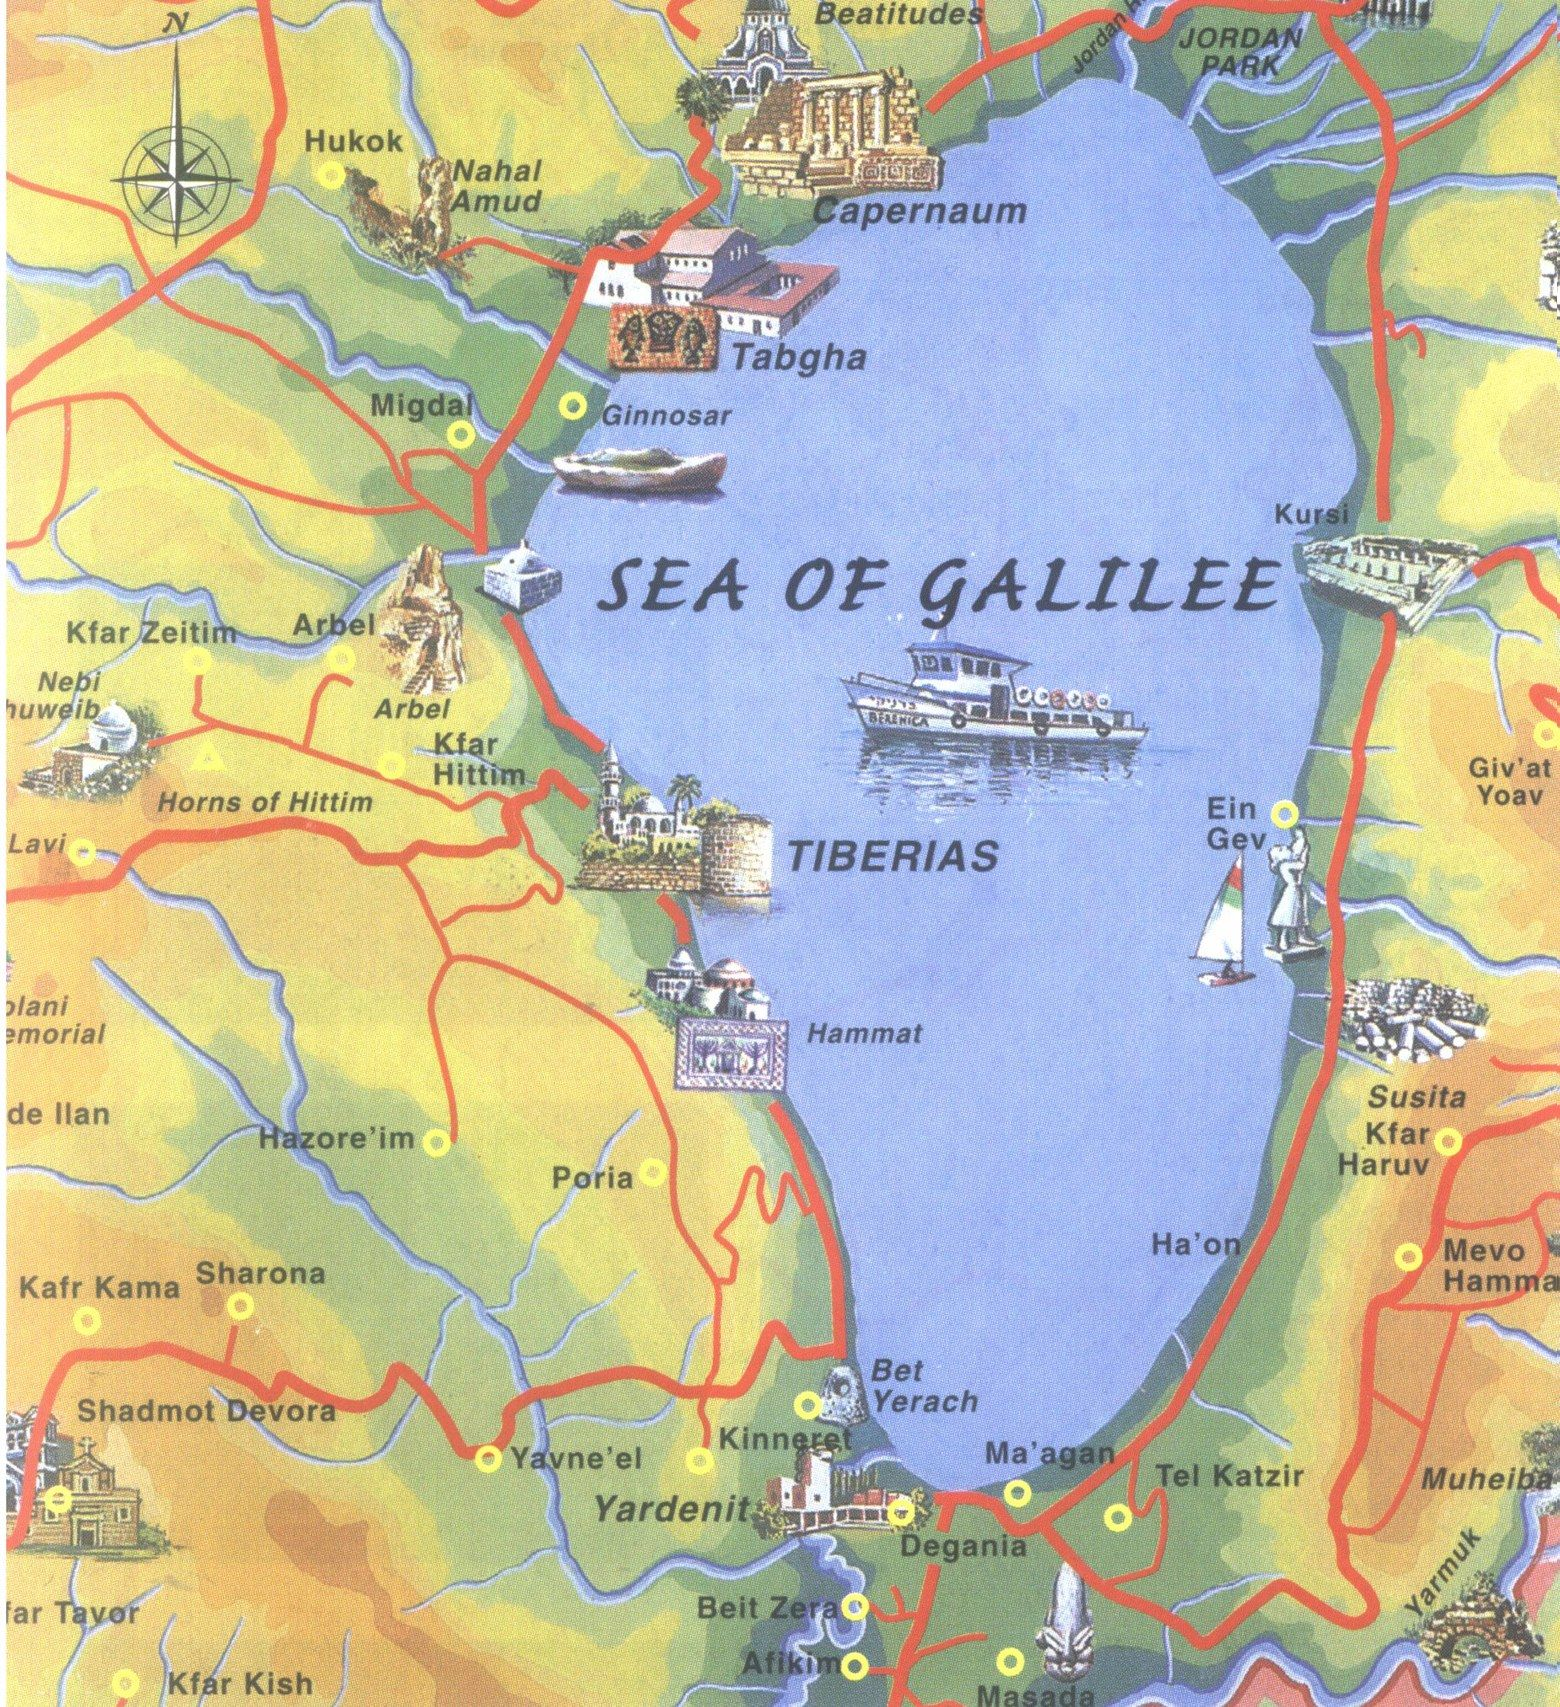 Sea of galilee map map israel sea of galilees church lessons sea of galilee map map israel sea of galilees gumiabroncs Gallery